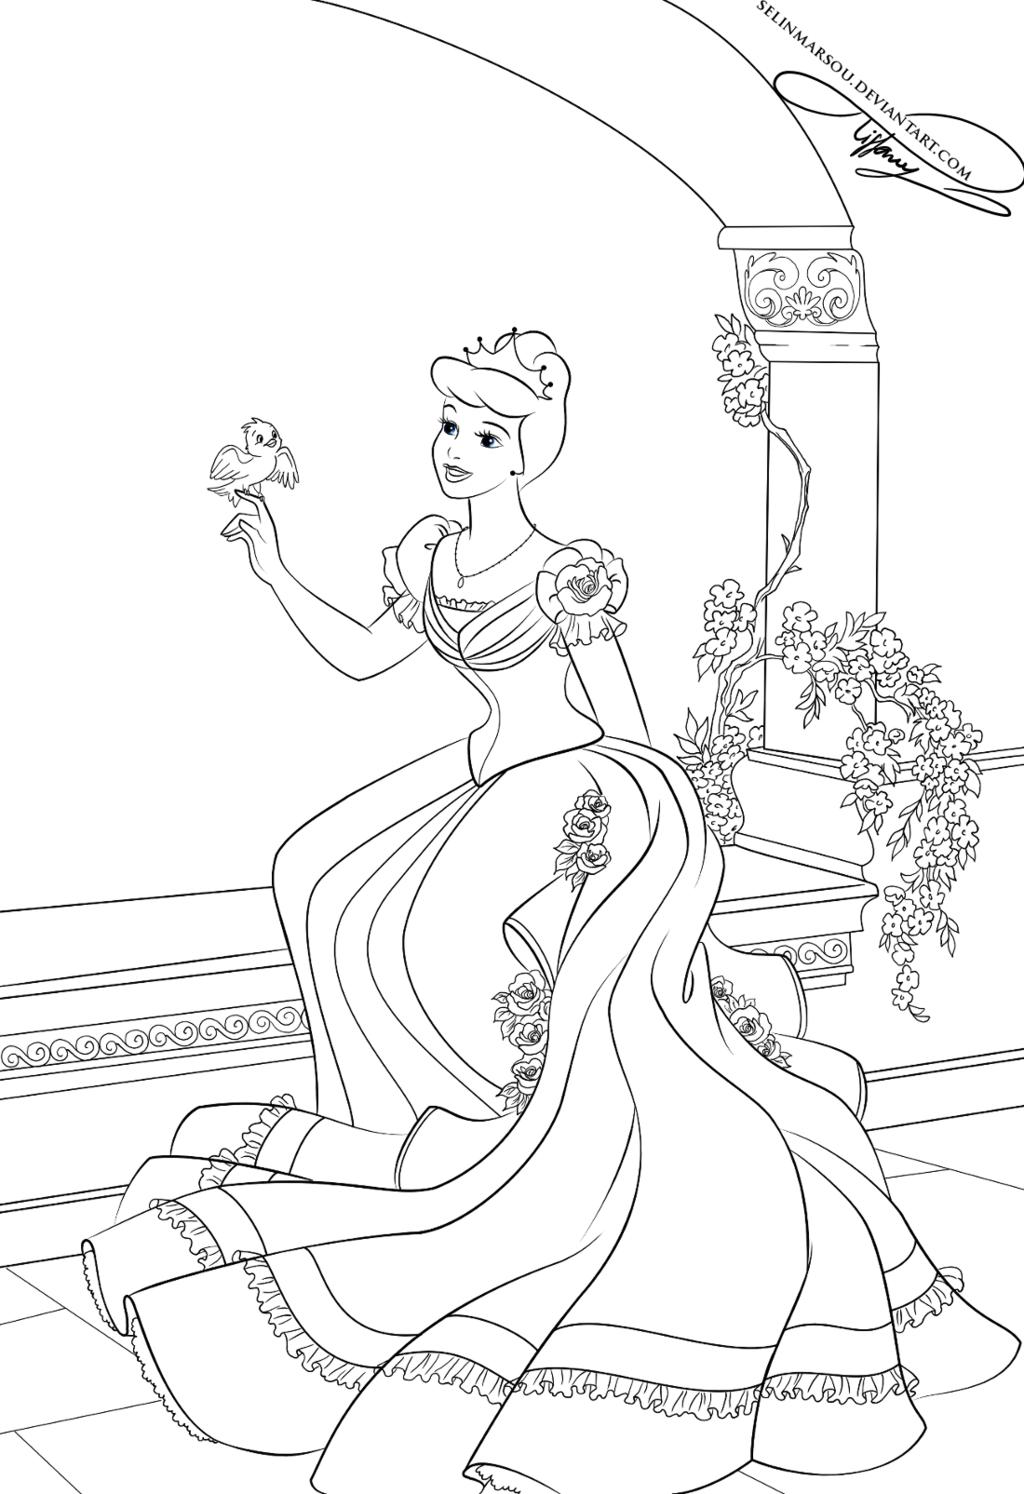 Lineart - Cinderella by selinmarsou.deviantart.com on @DeviantArt ...